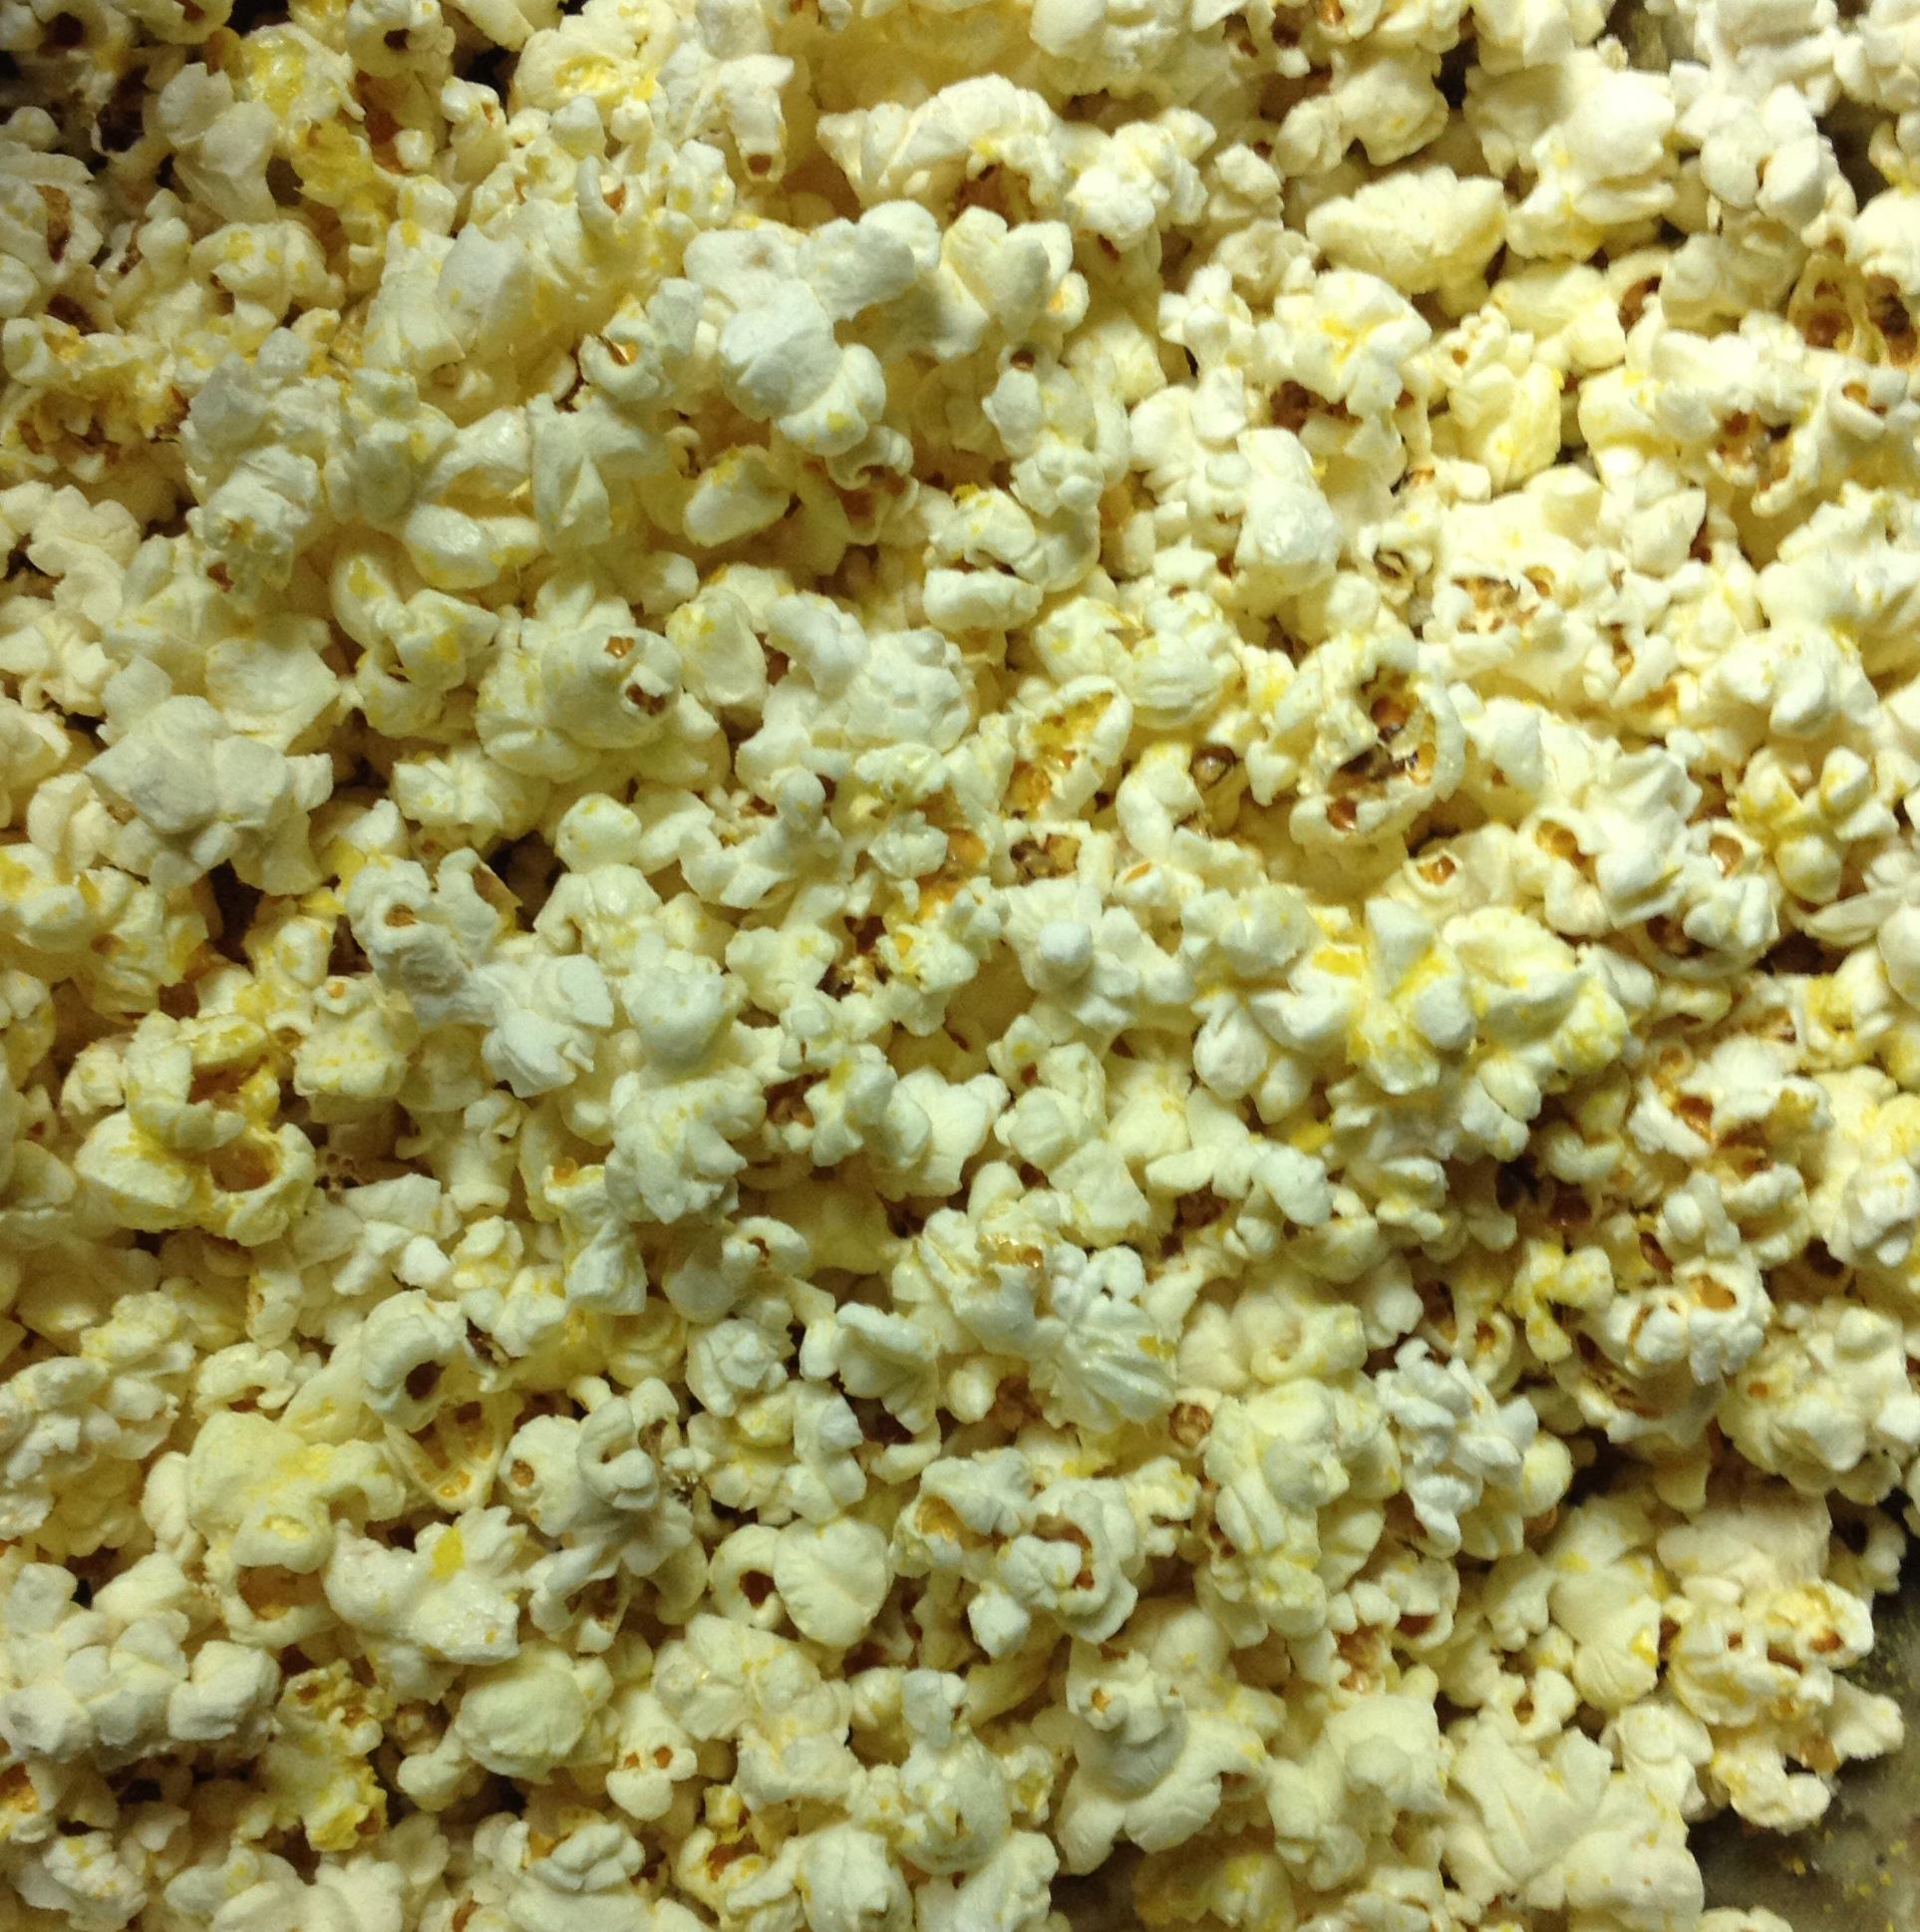 Aztec Popcorn Microwave popcorn was my